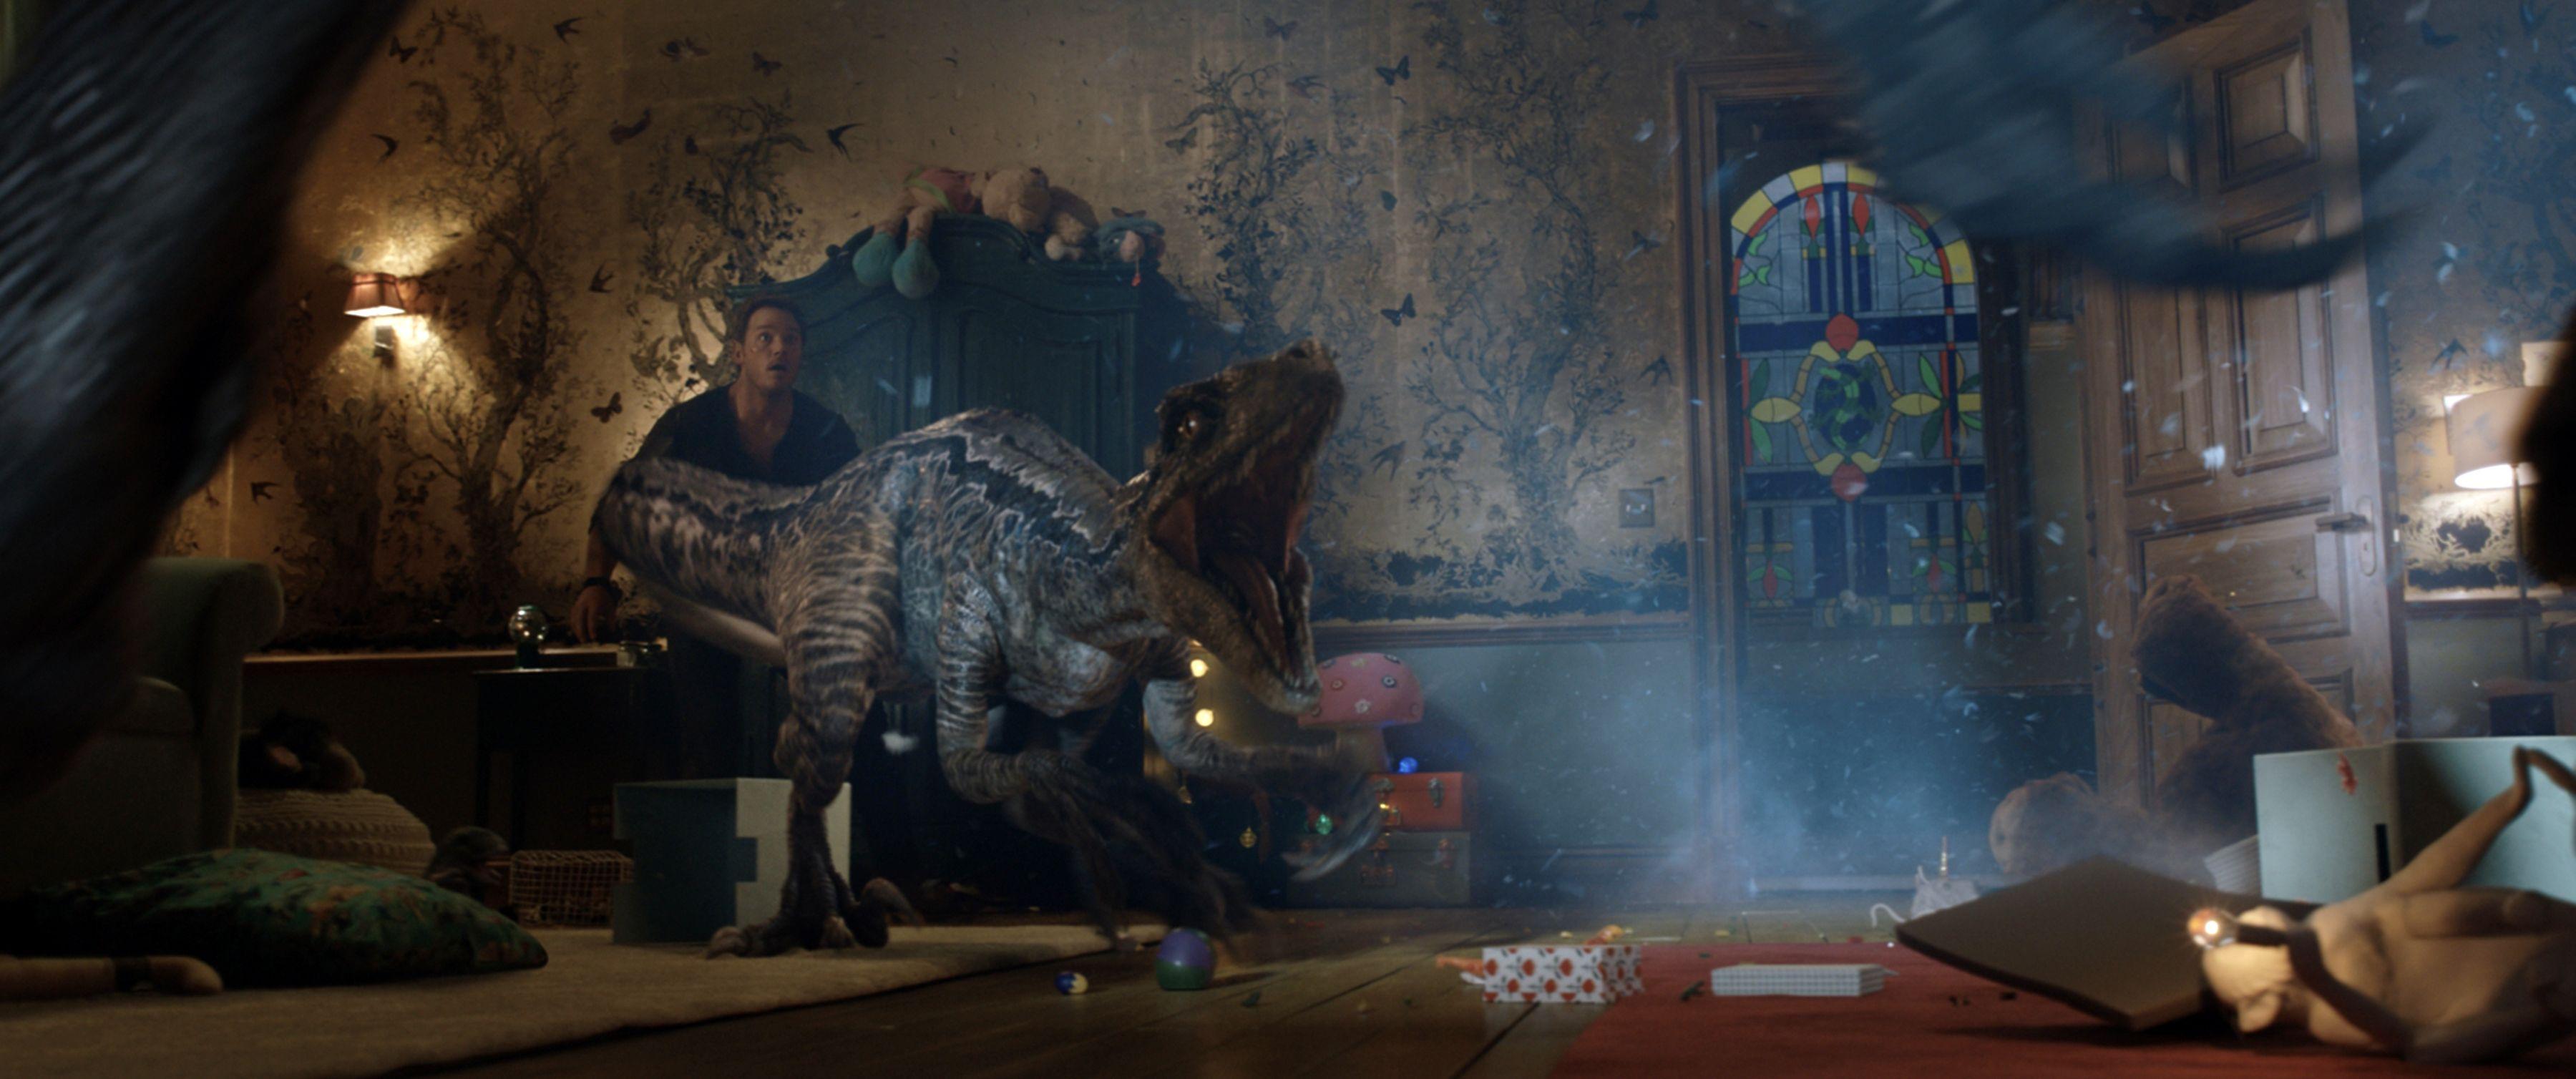 Jurassic World 2 Story Details